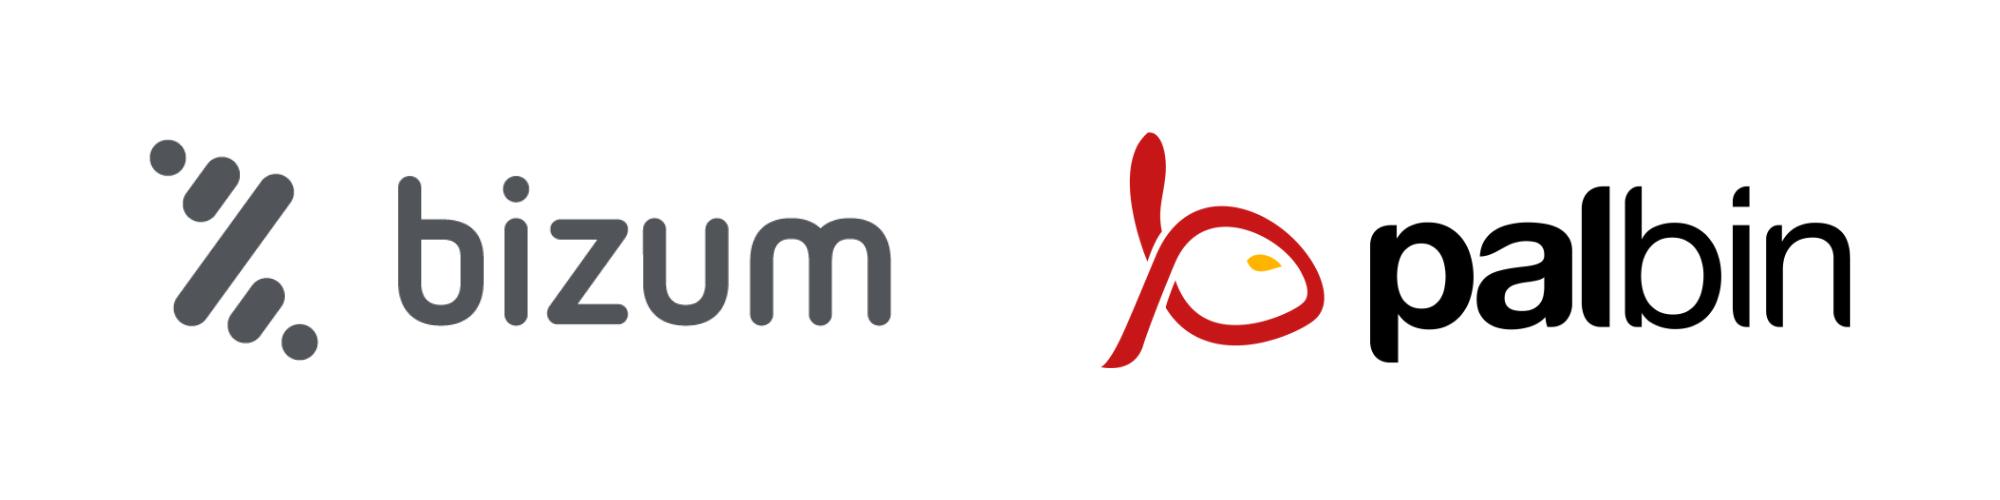 Foto de Logo Palbin y Bizum